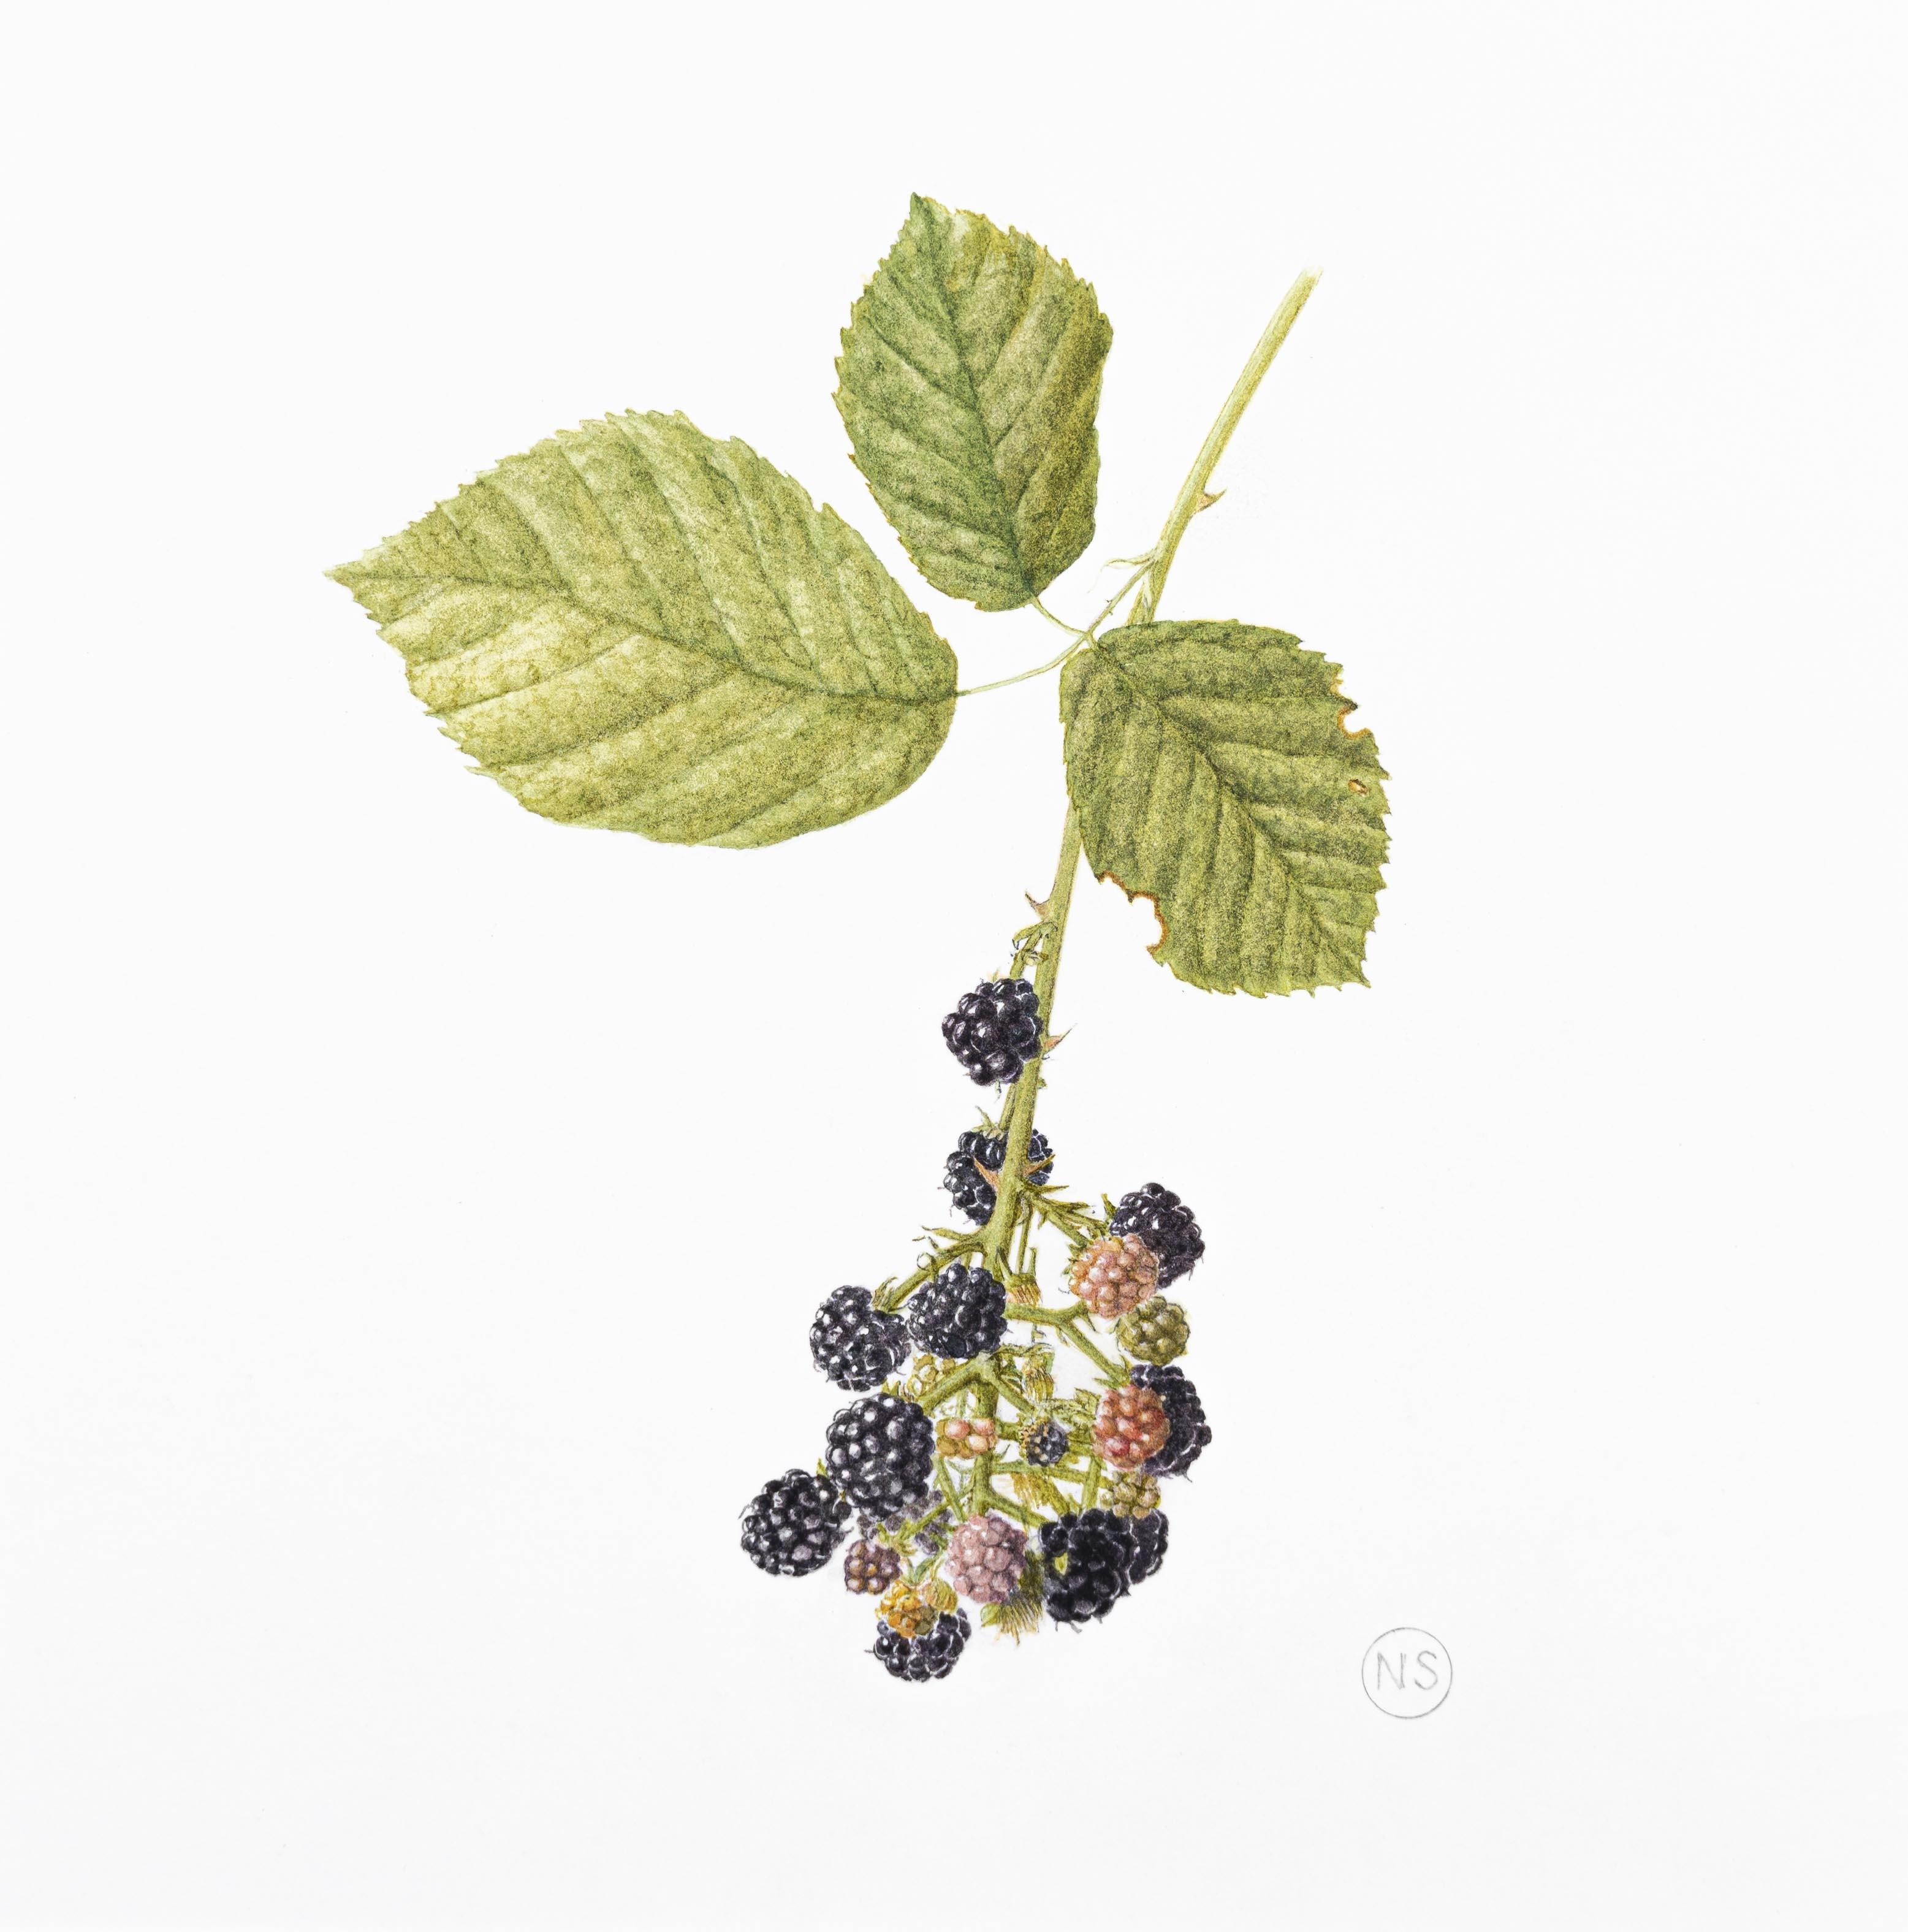 Rubus fruticosus agg.